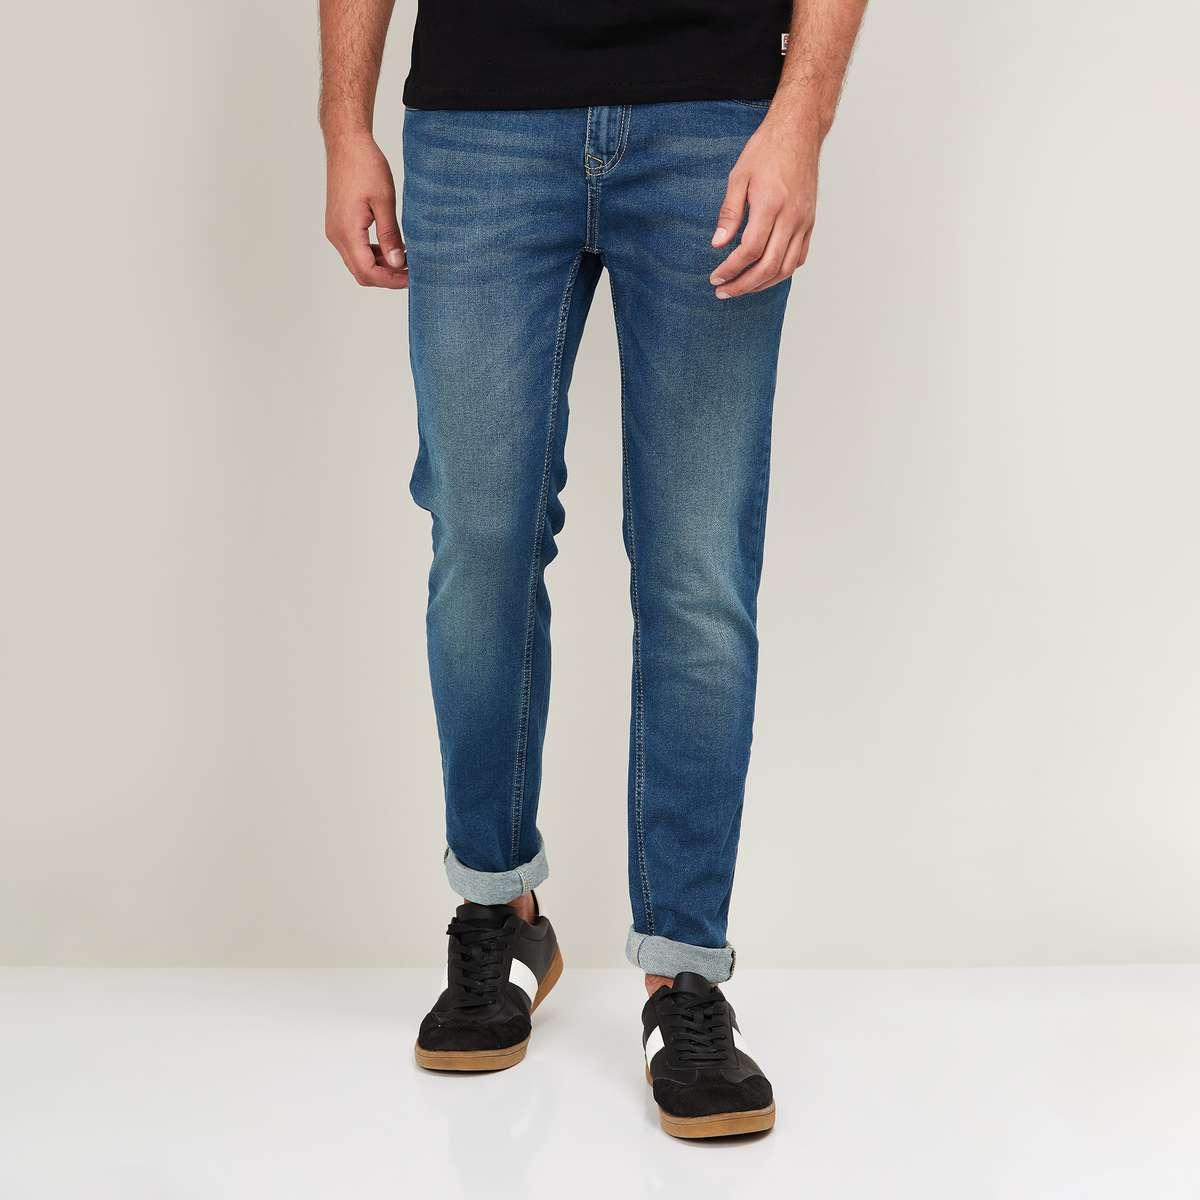 2.DENIMIZE-Men-Stonewashed-Slim-Tapered-Fit-Jeans